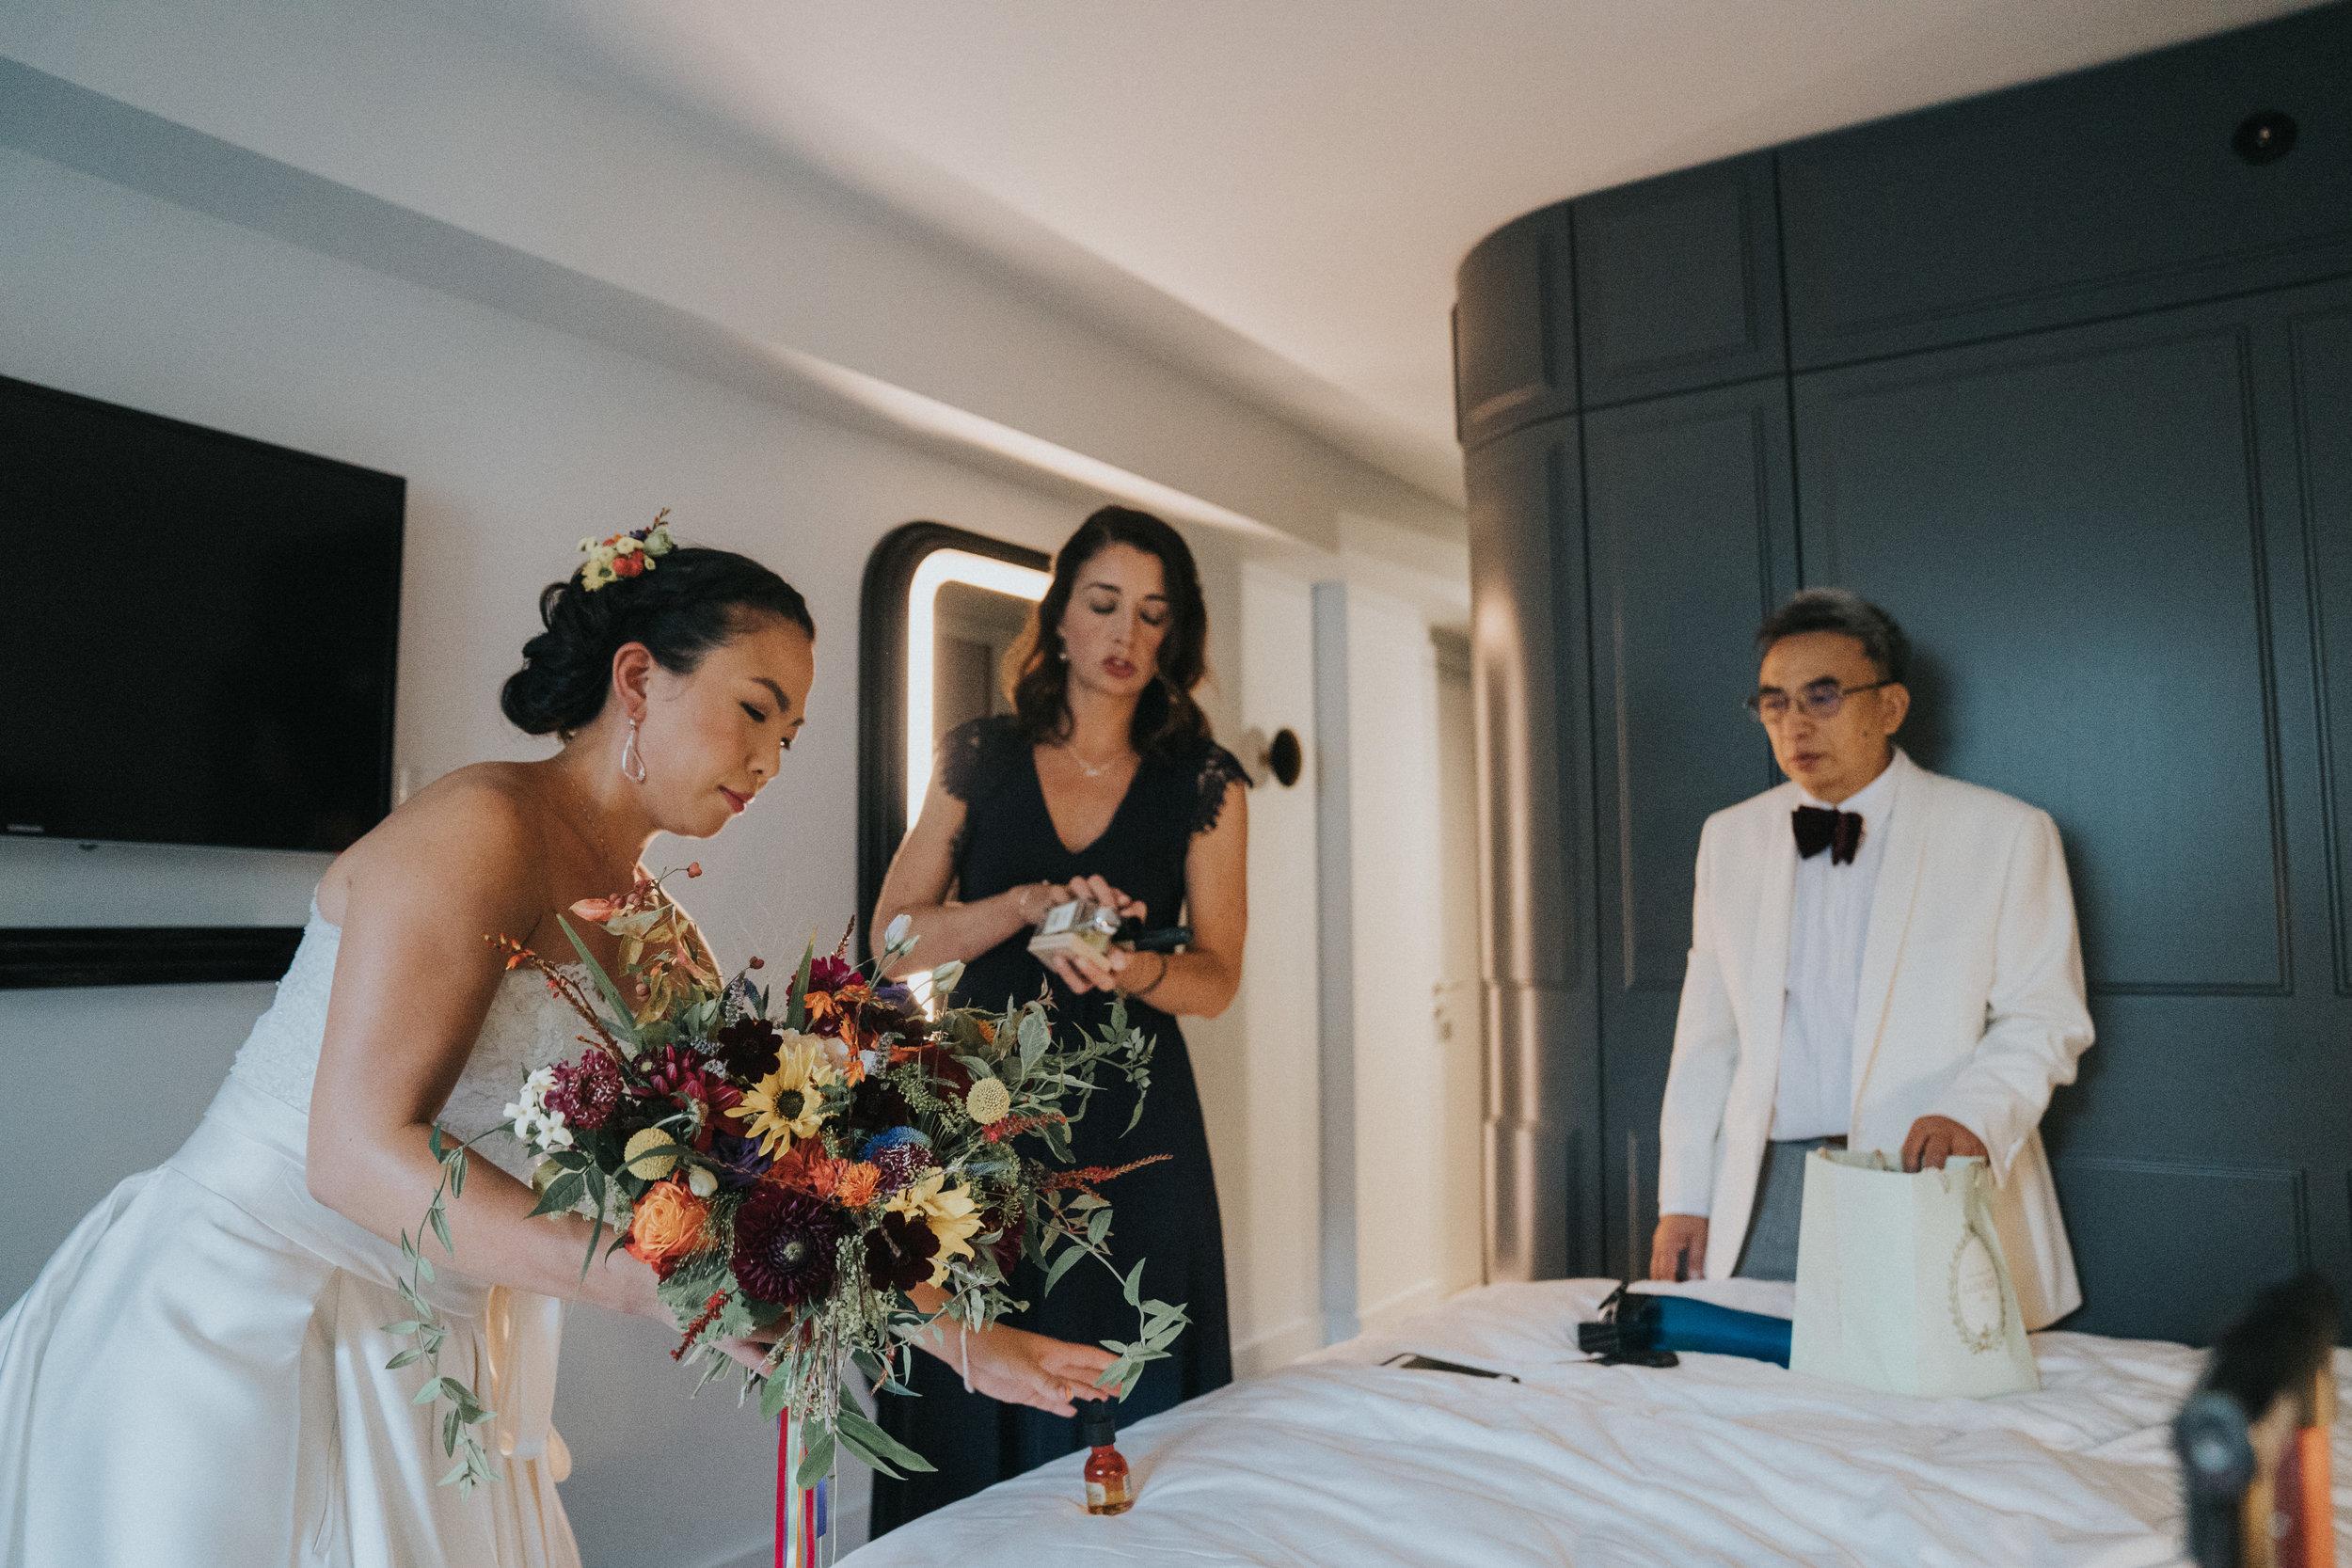 river-rooms-blackfriars-london-stpauls-mondrian-hotel-wedding-photography-videography-20